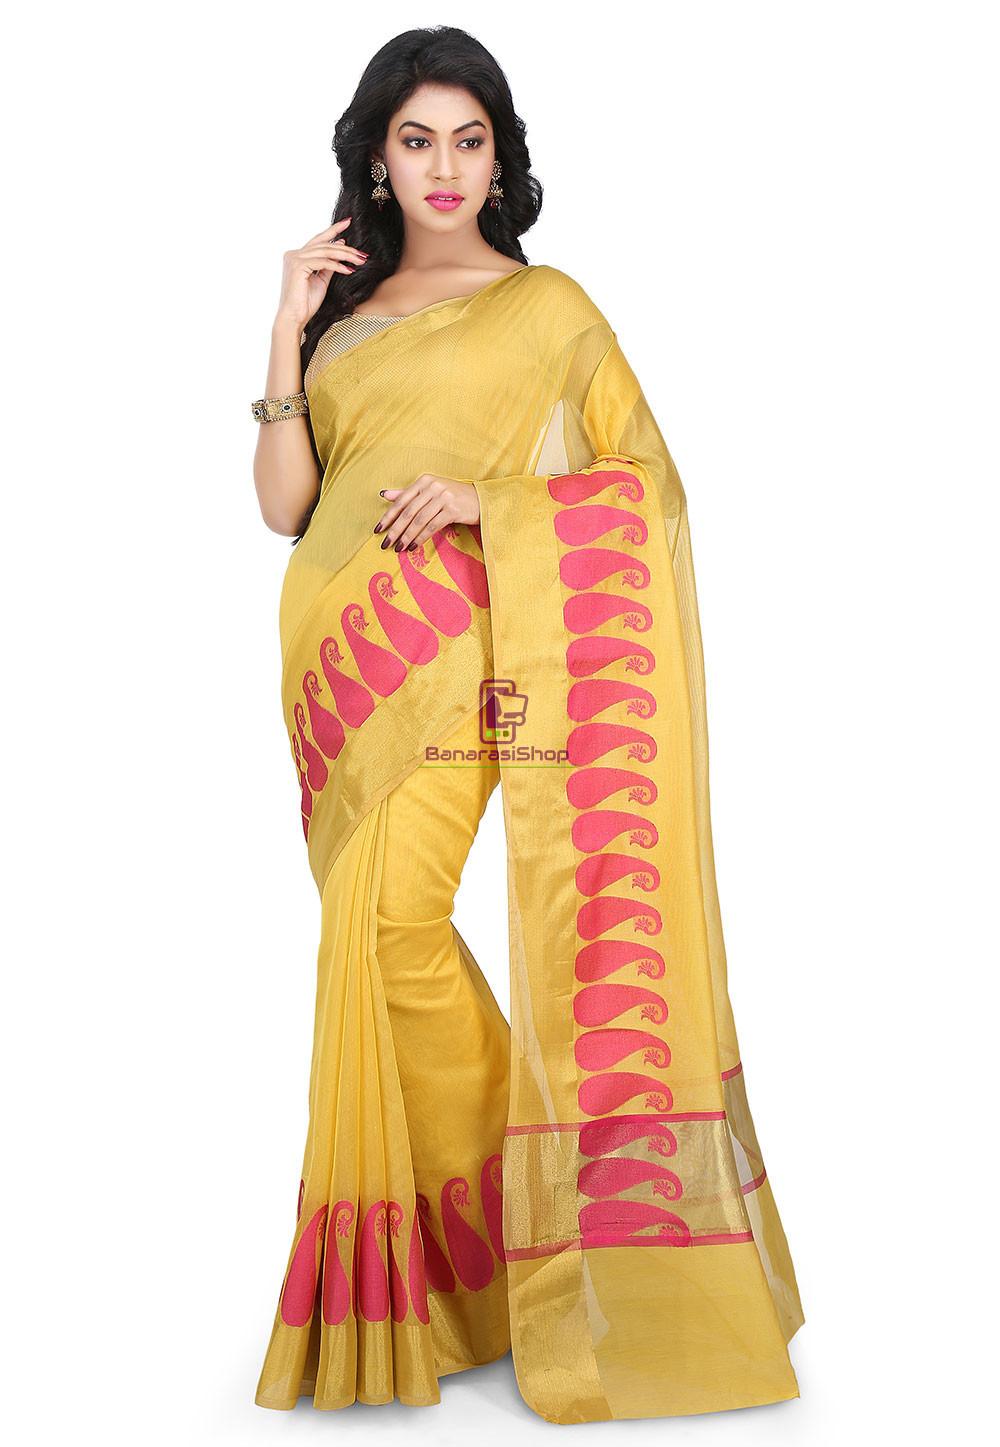 Woven Banarasi Chanderi Cotton Saree in Yellow 1